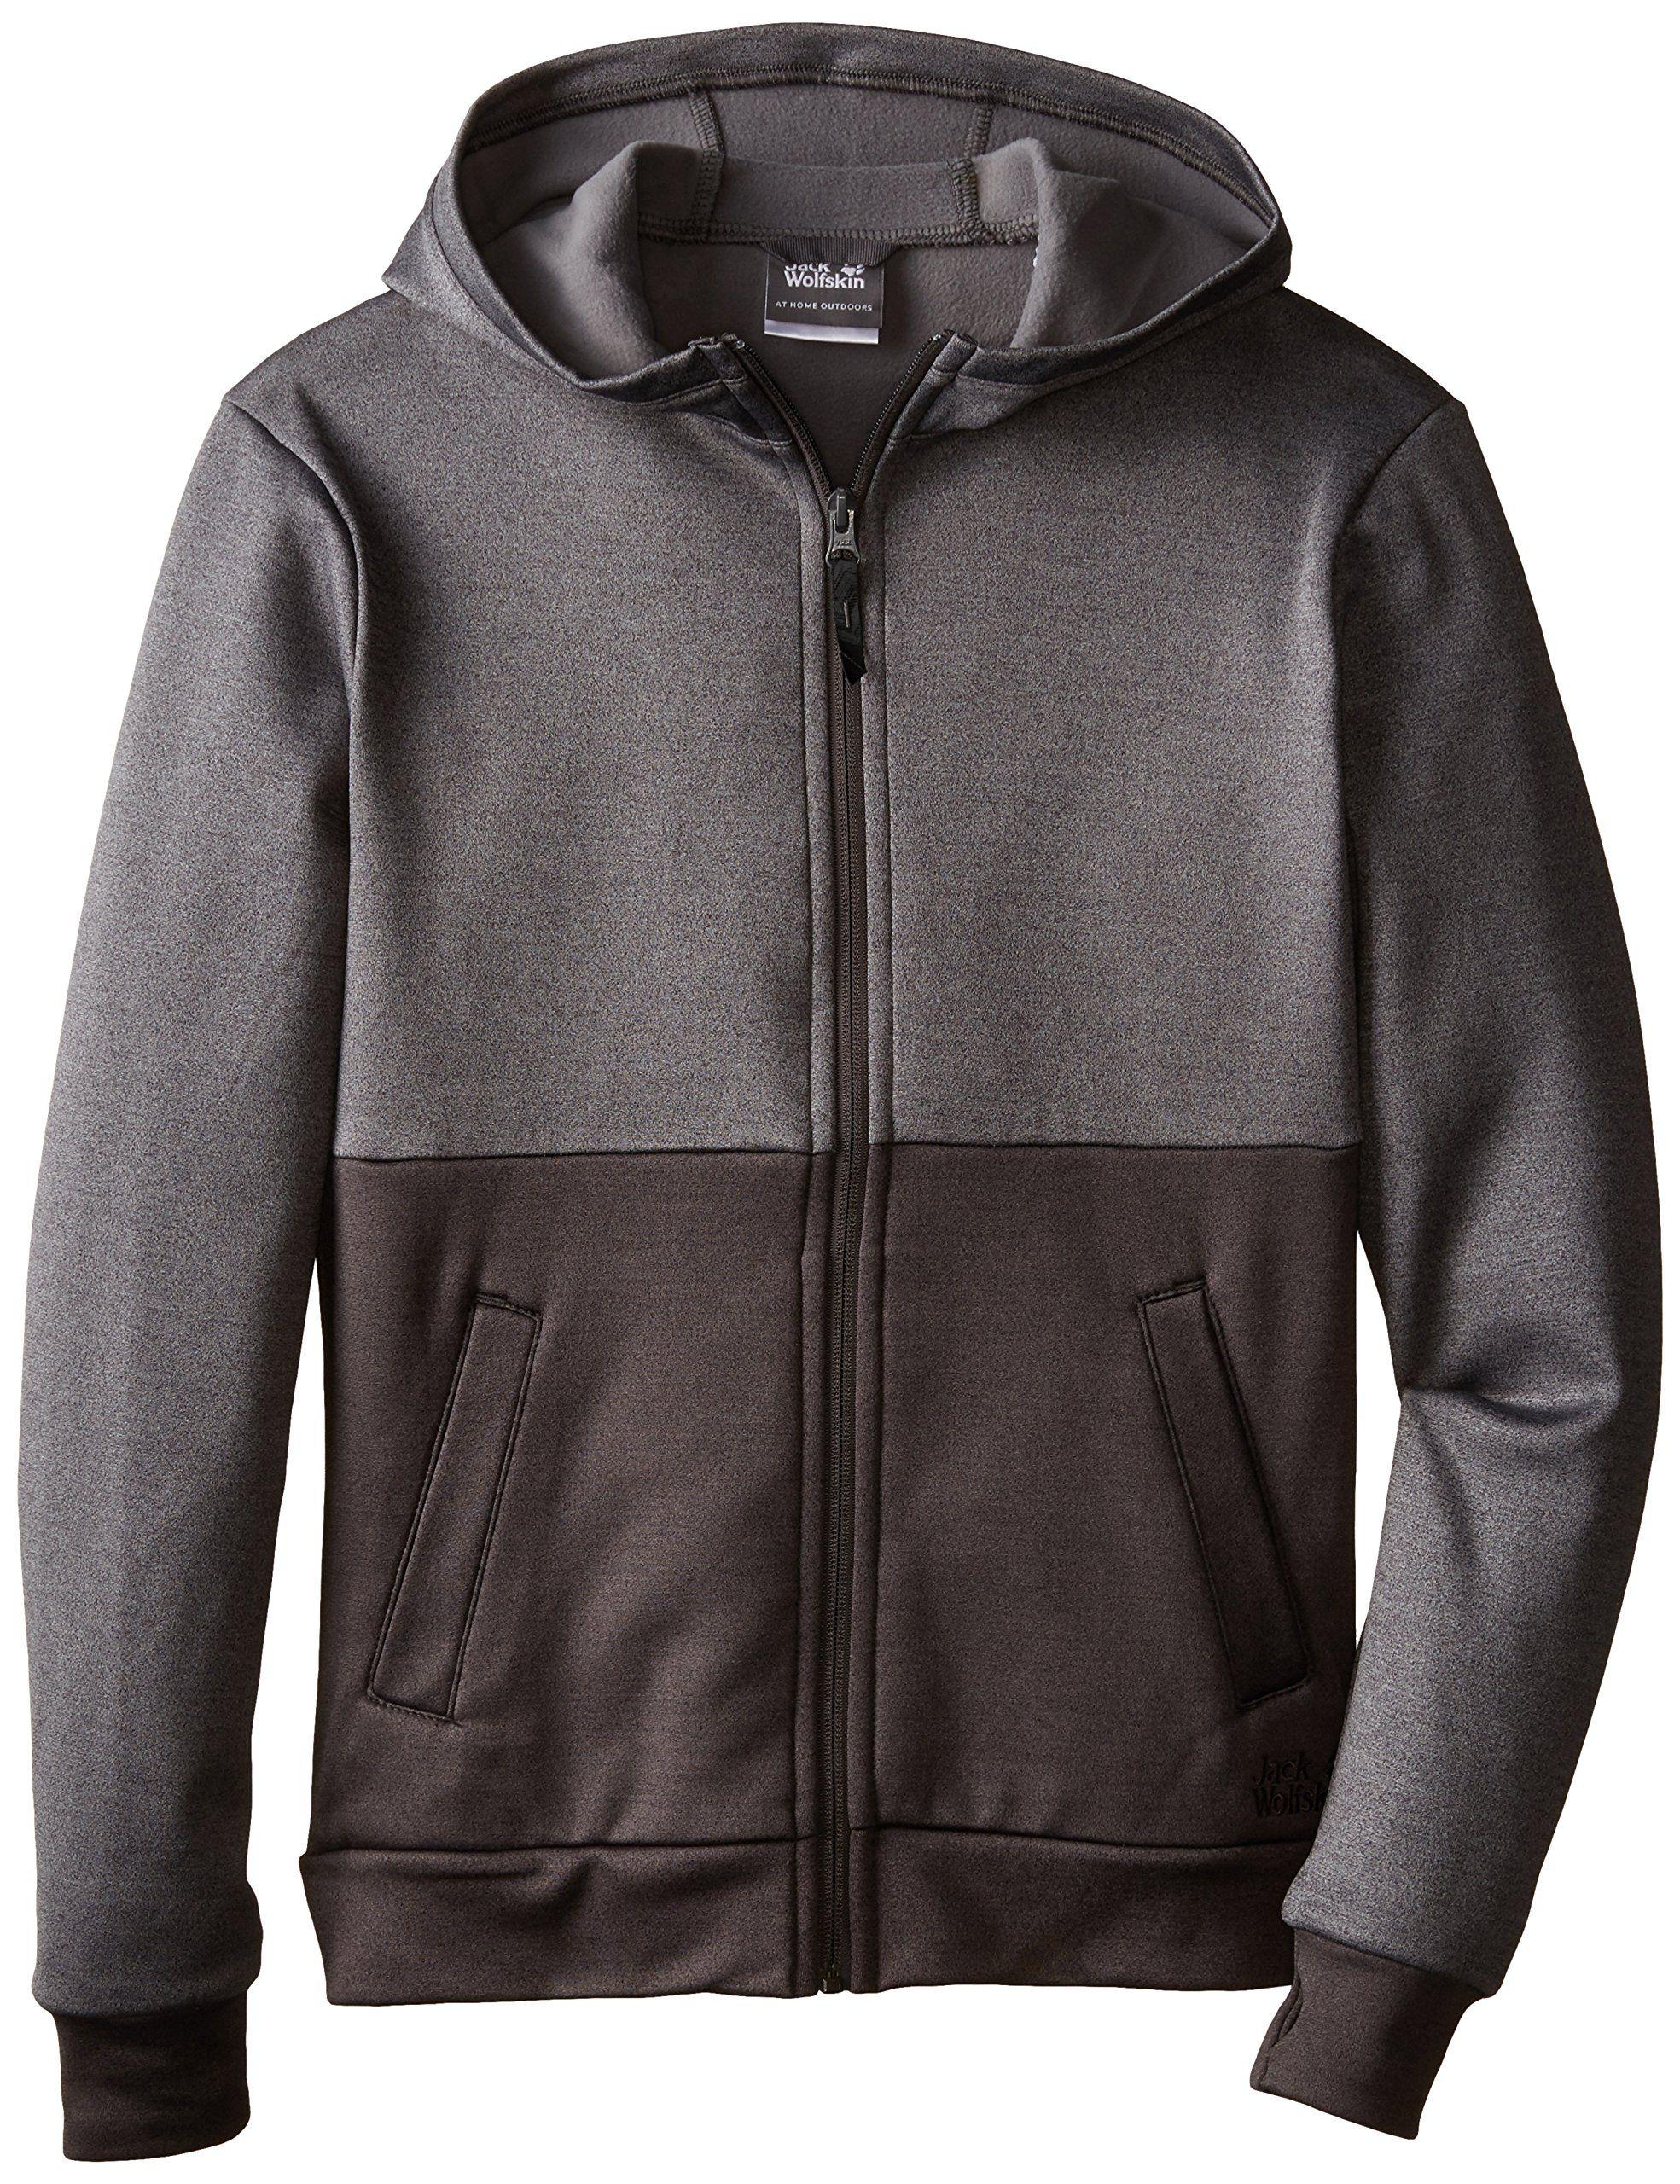 online retailer 8fce3 e1aed Jack Wolfskin Boy's Freedom Nanuk Jacket, Dark Grey Heather ...